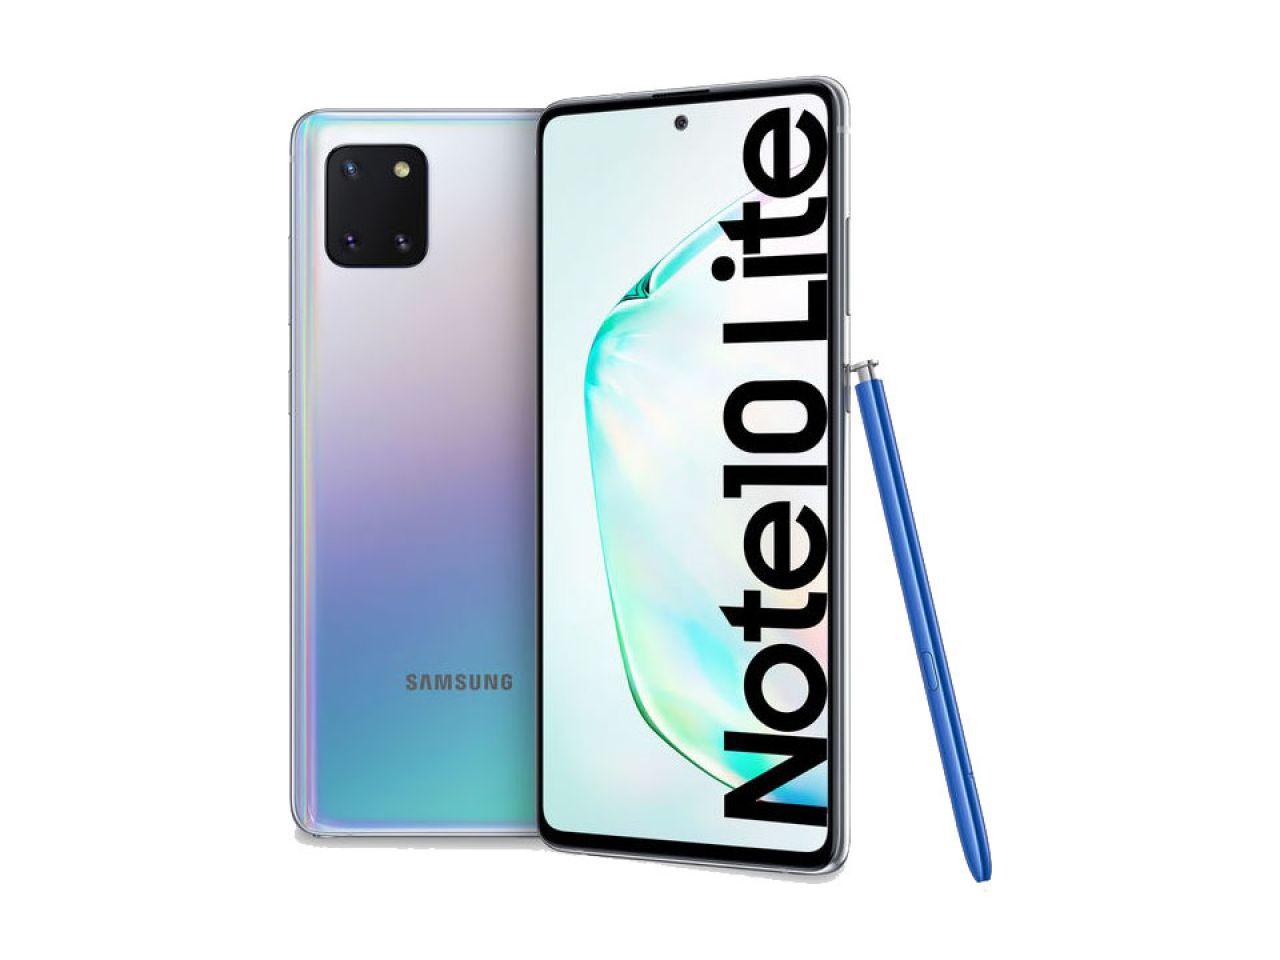 Samsung Note 4 Edge MediaWorld